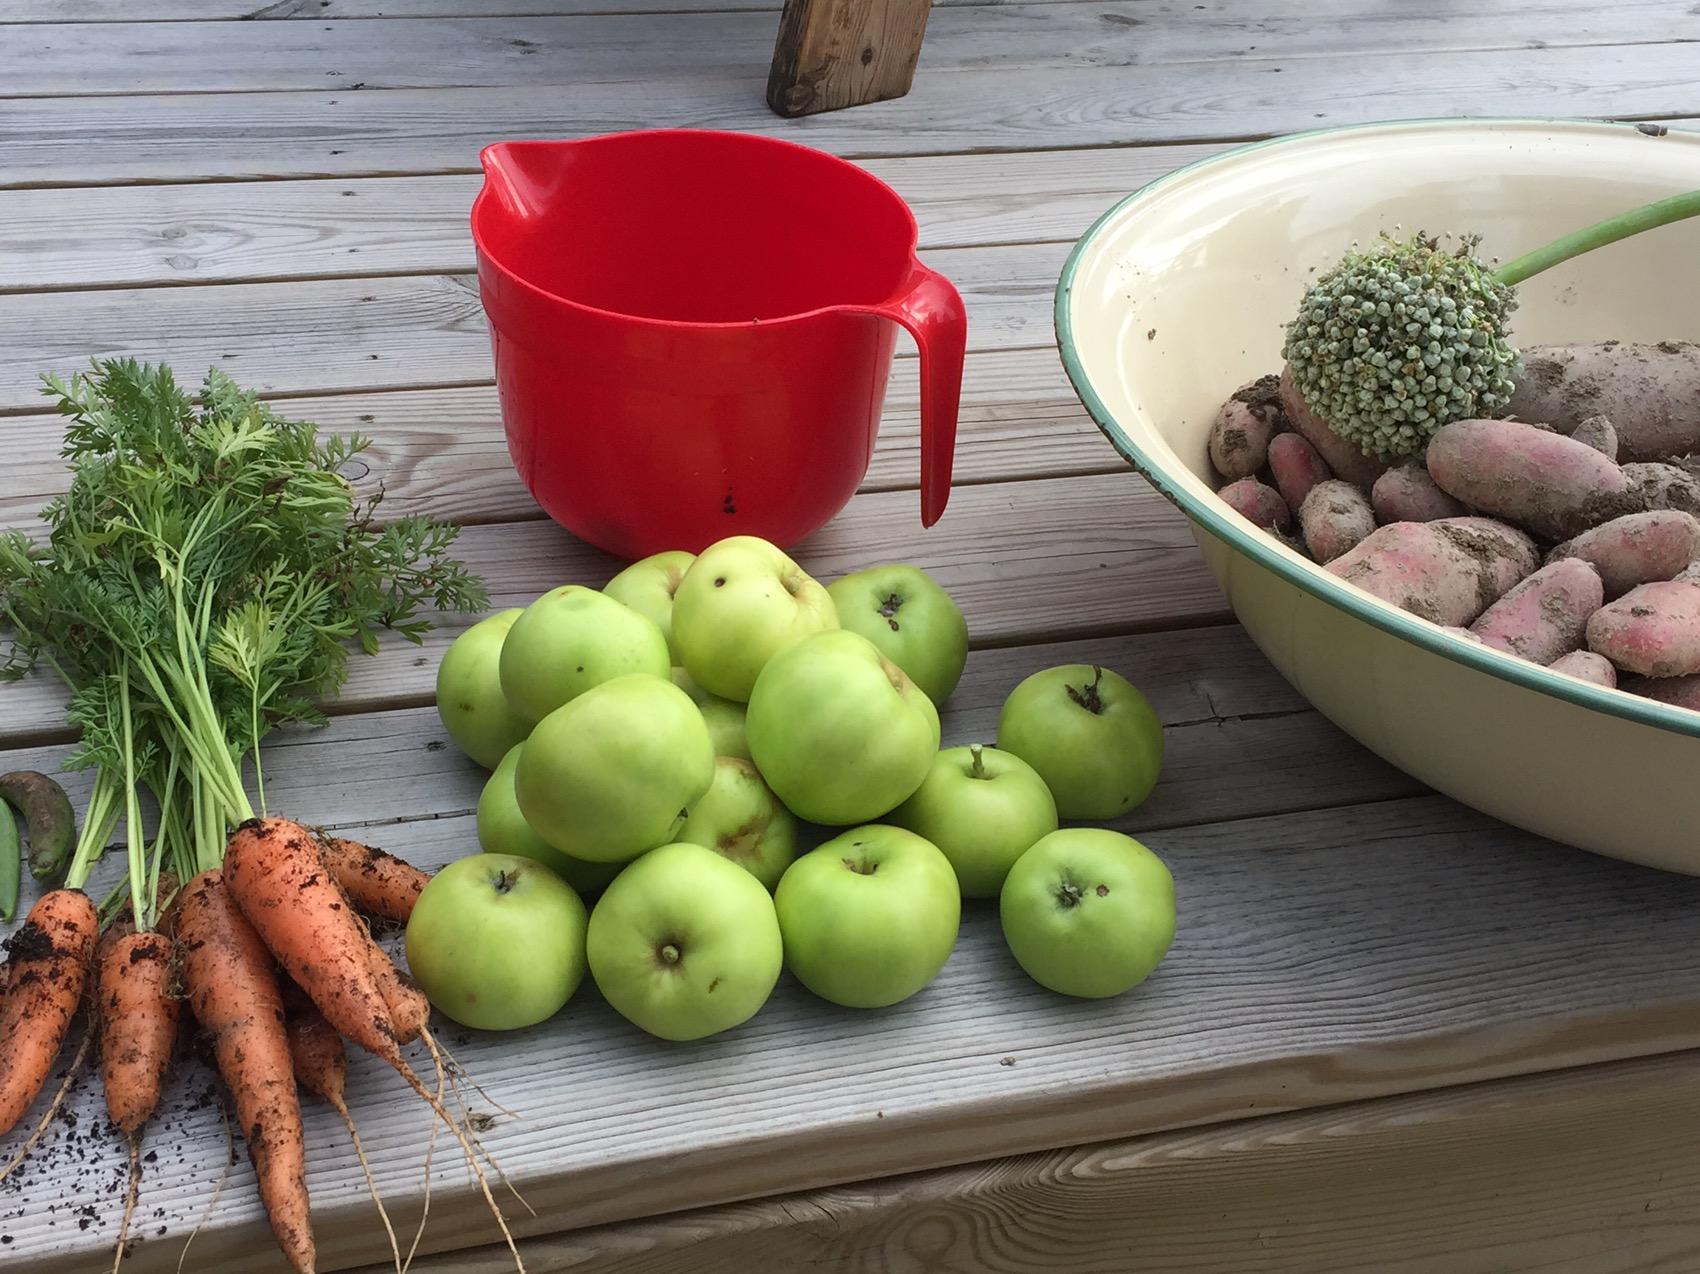 plantera syren beskära